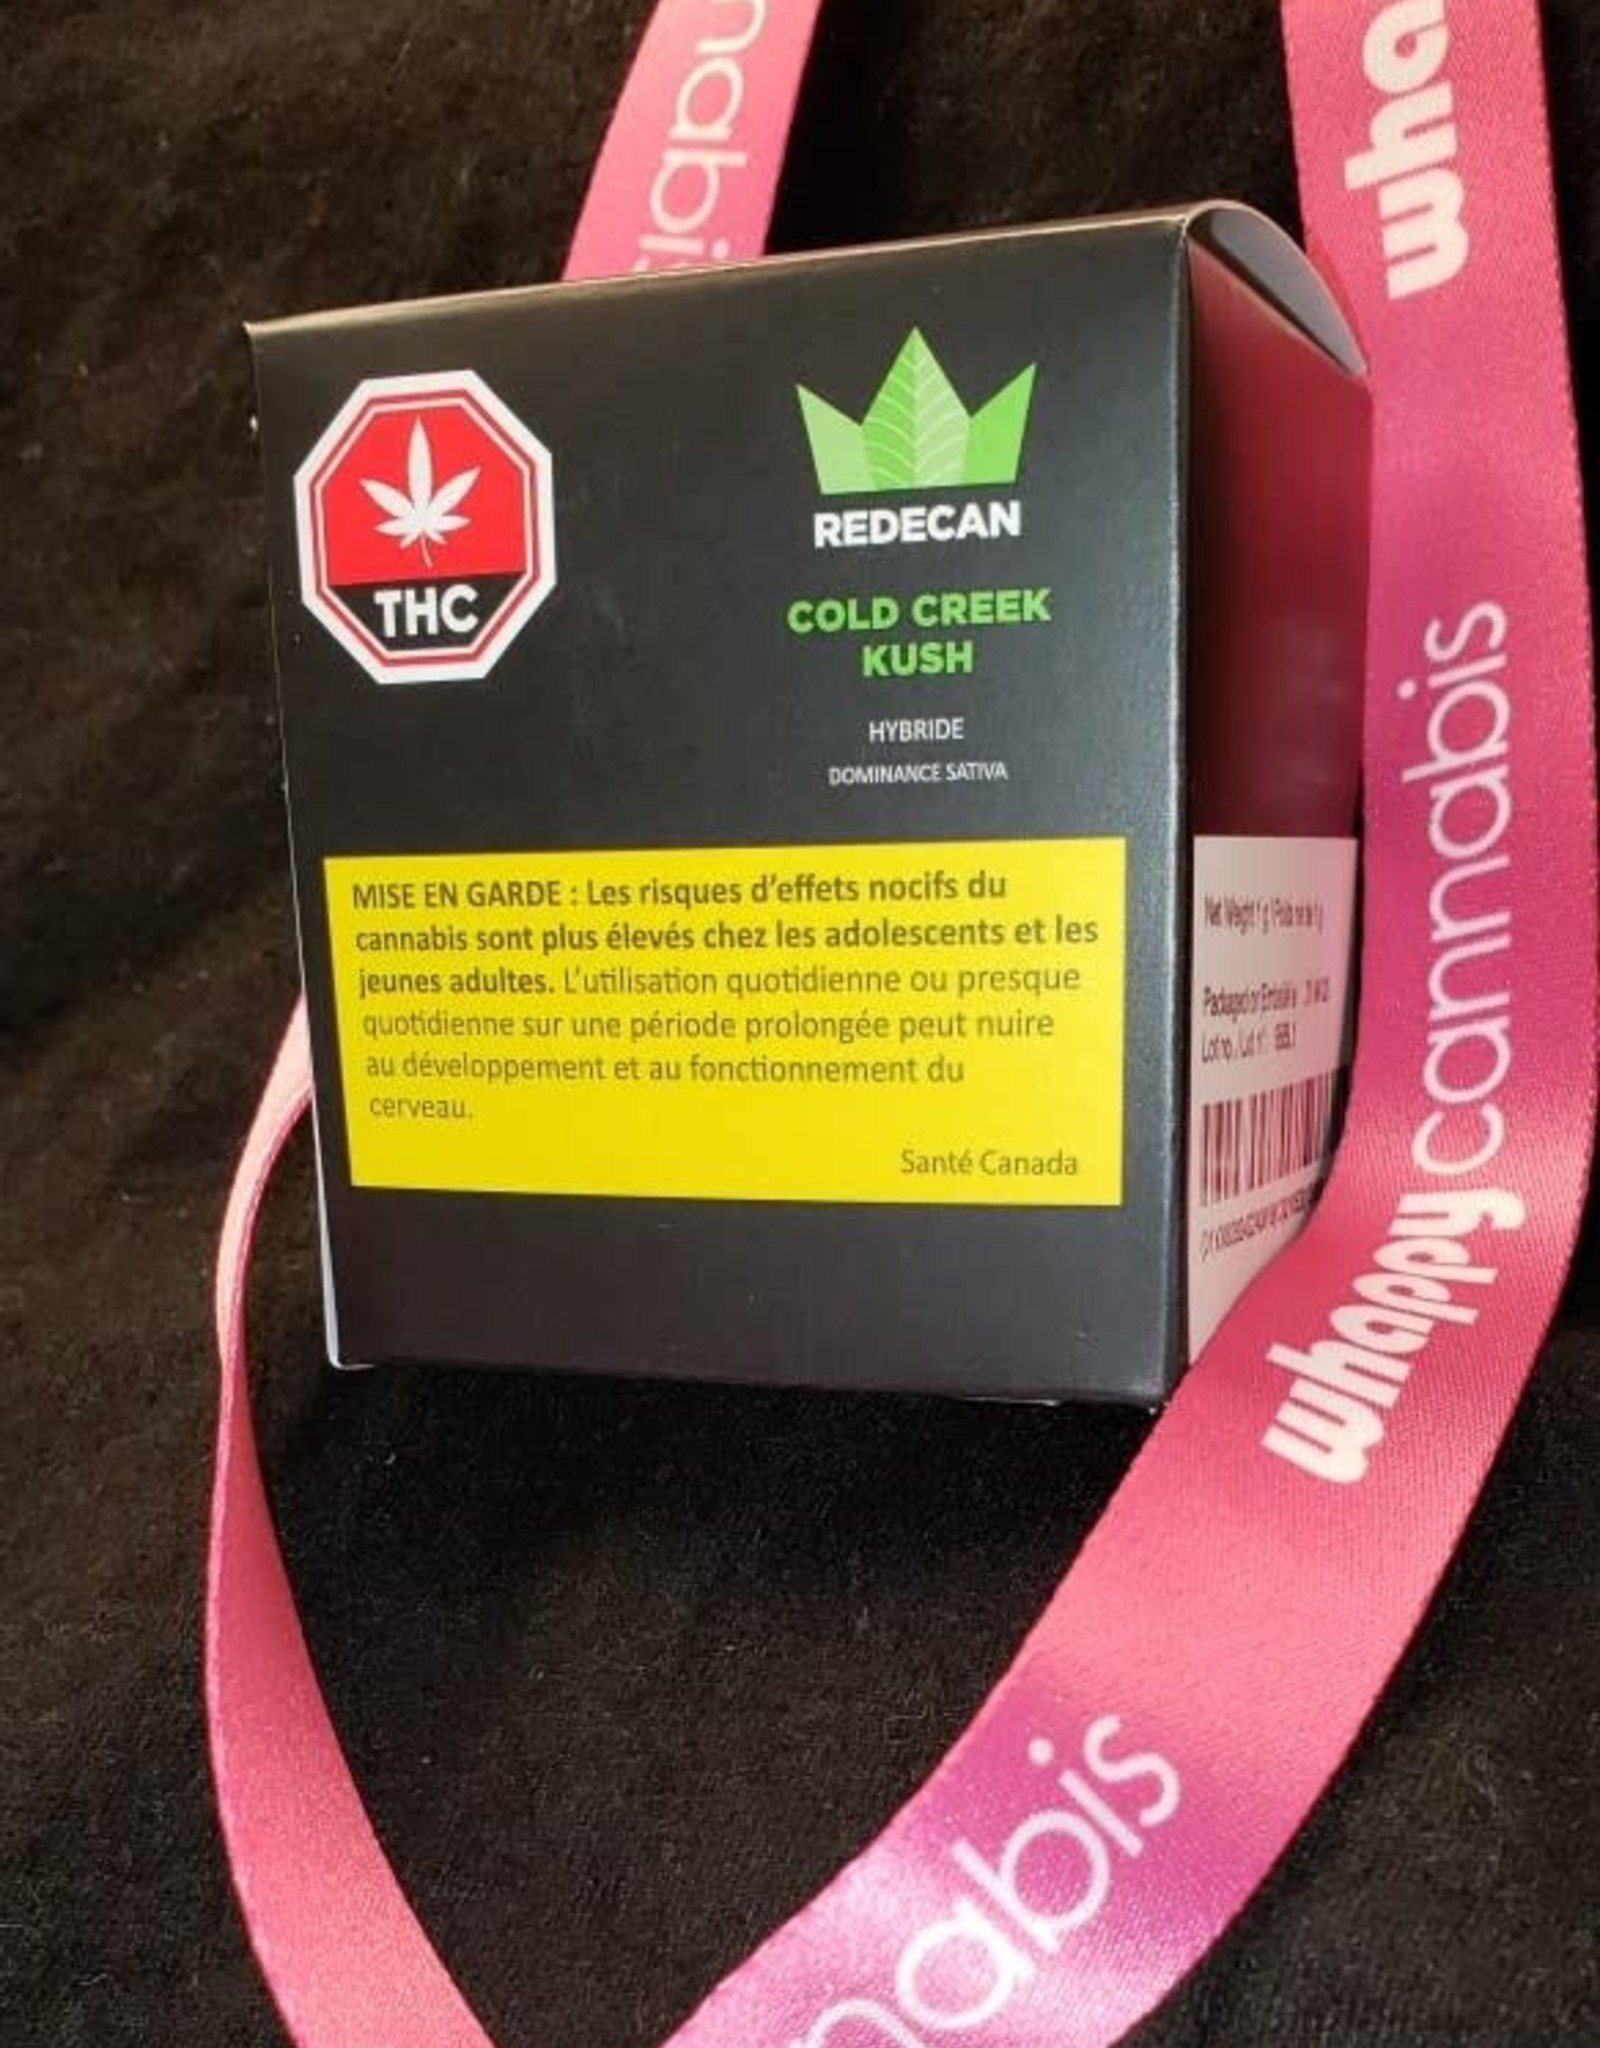 Redecan Redecan - Cold Creek Kush Hybrid, Sativa Dom. 1g